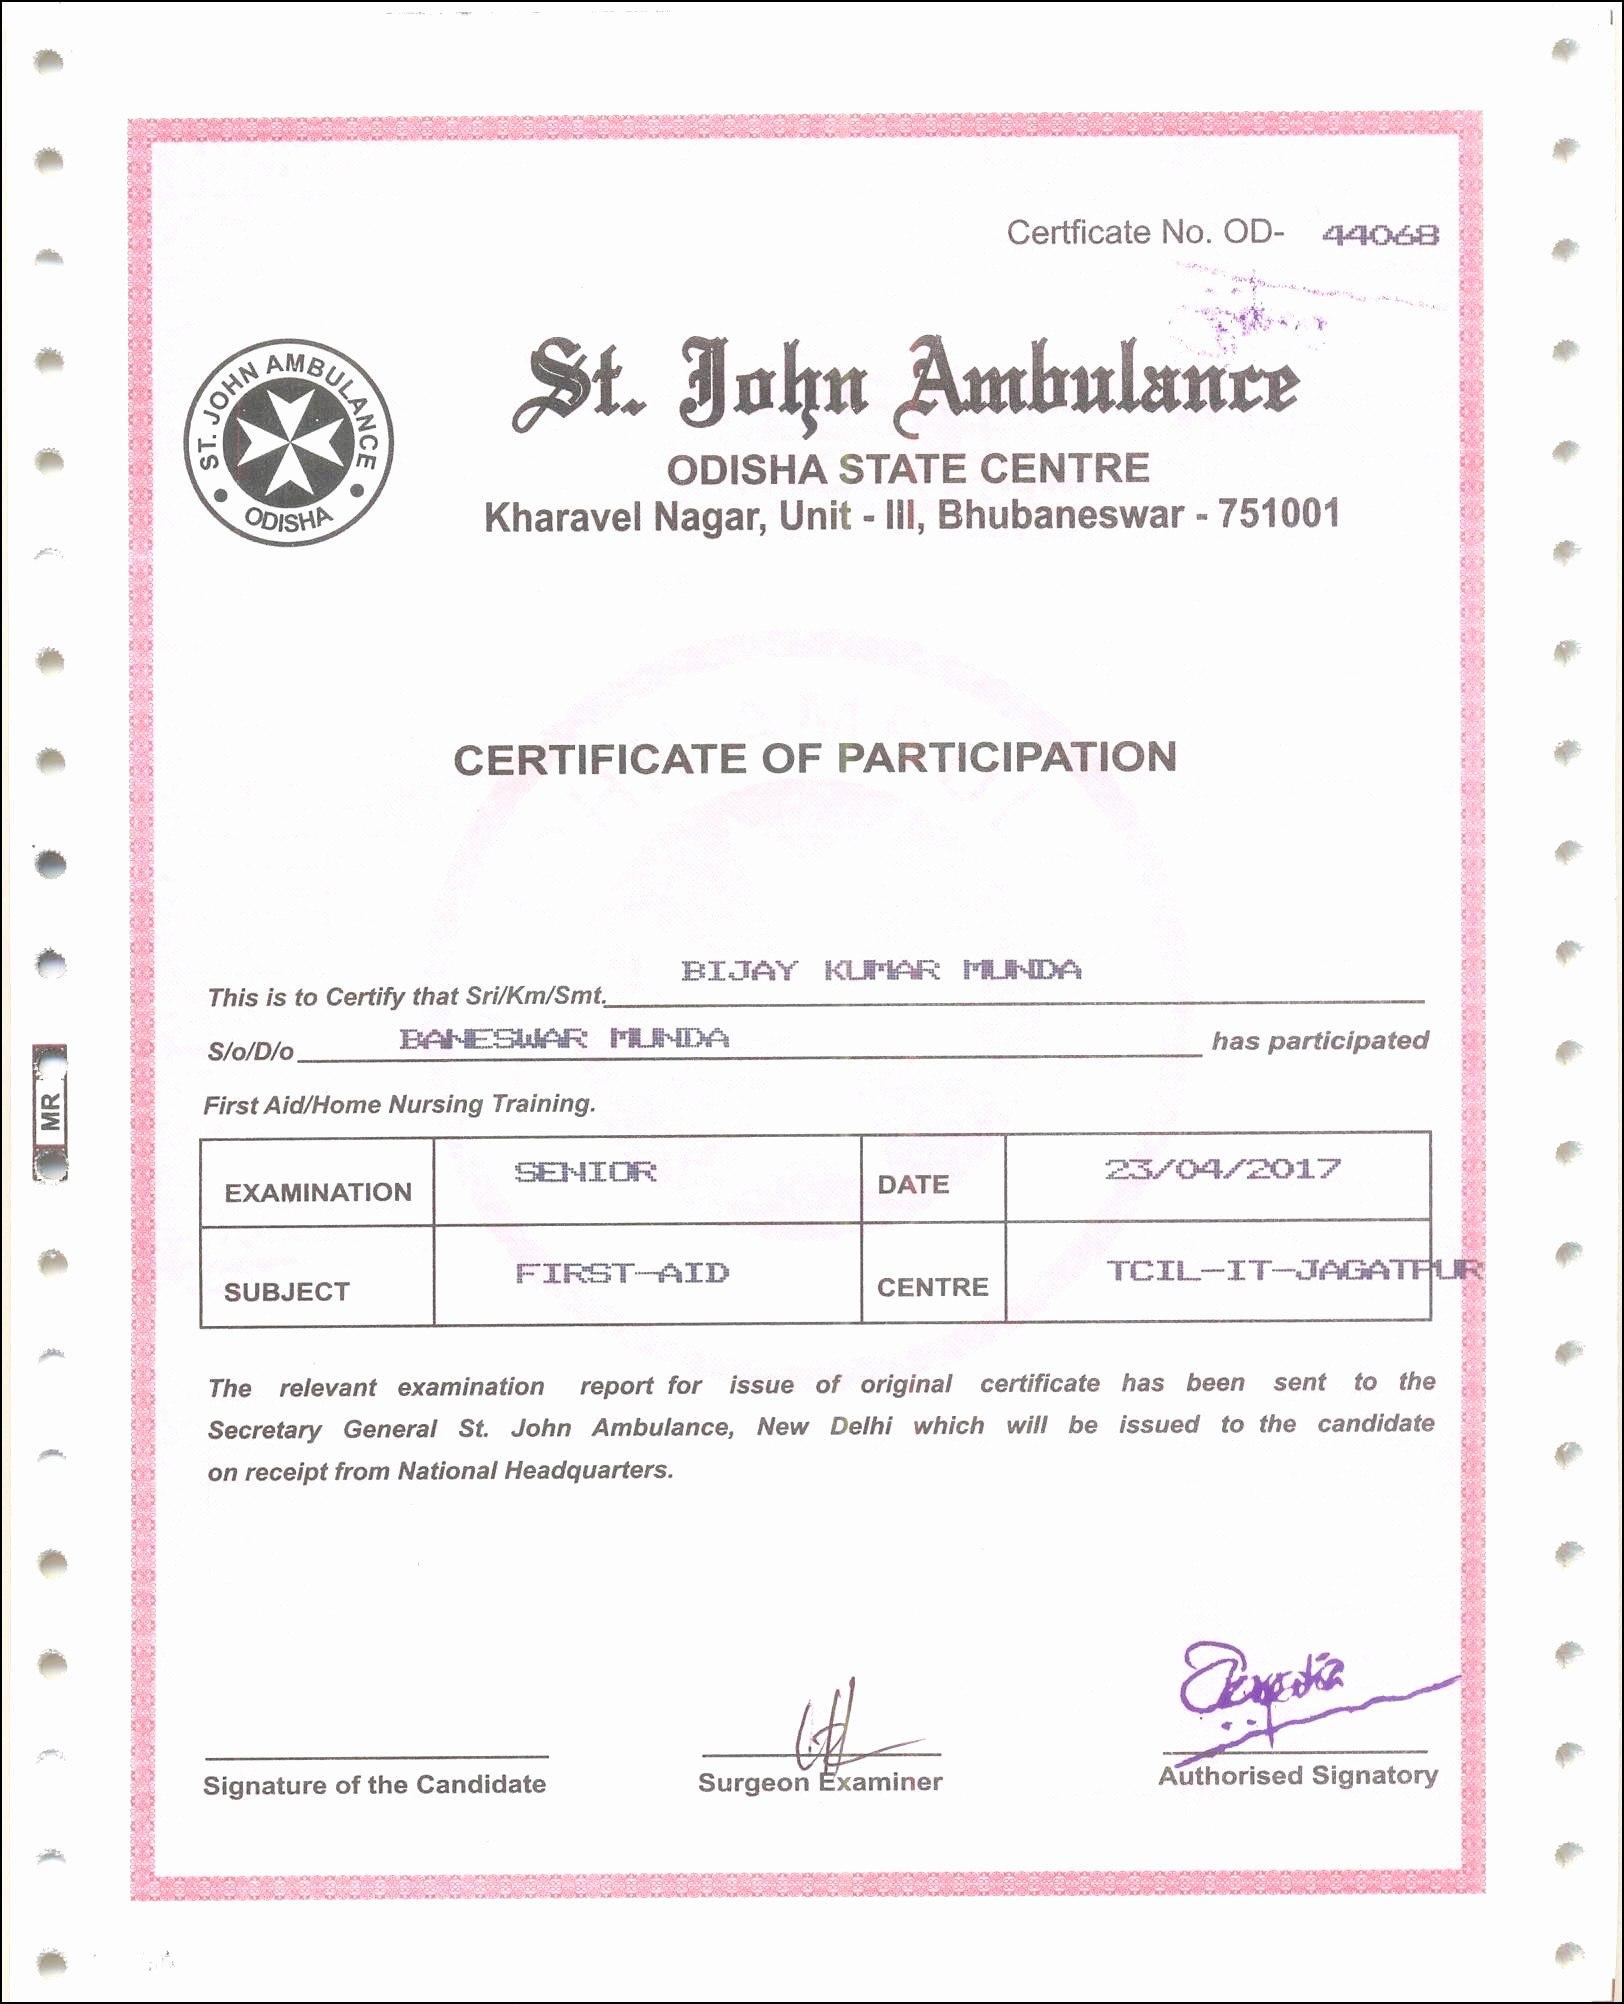 Translation Certification Statement Of American Birth Certificate Intended For Birth Certificate Translation Template Uscis